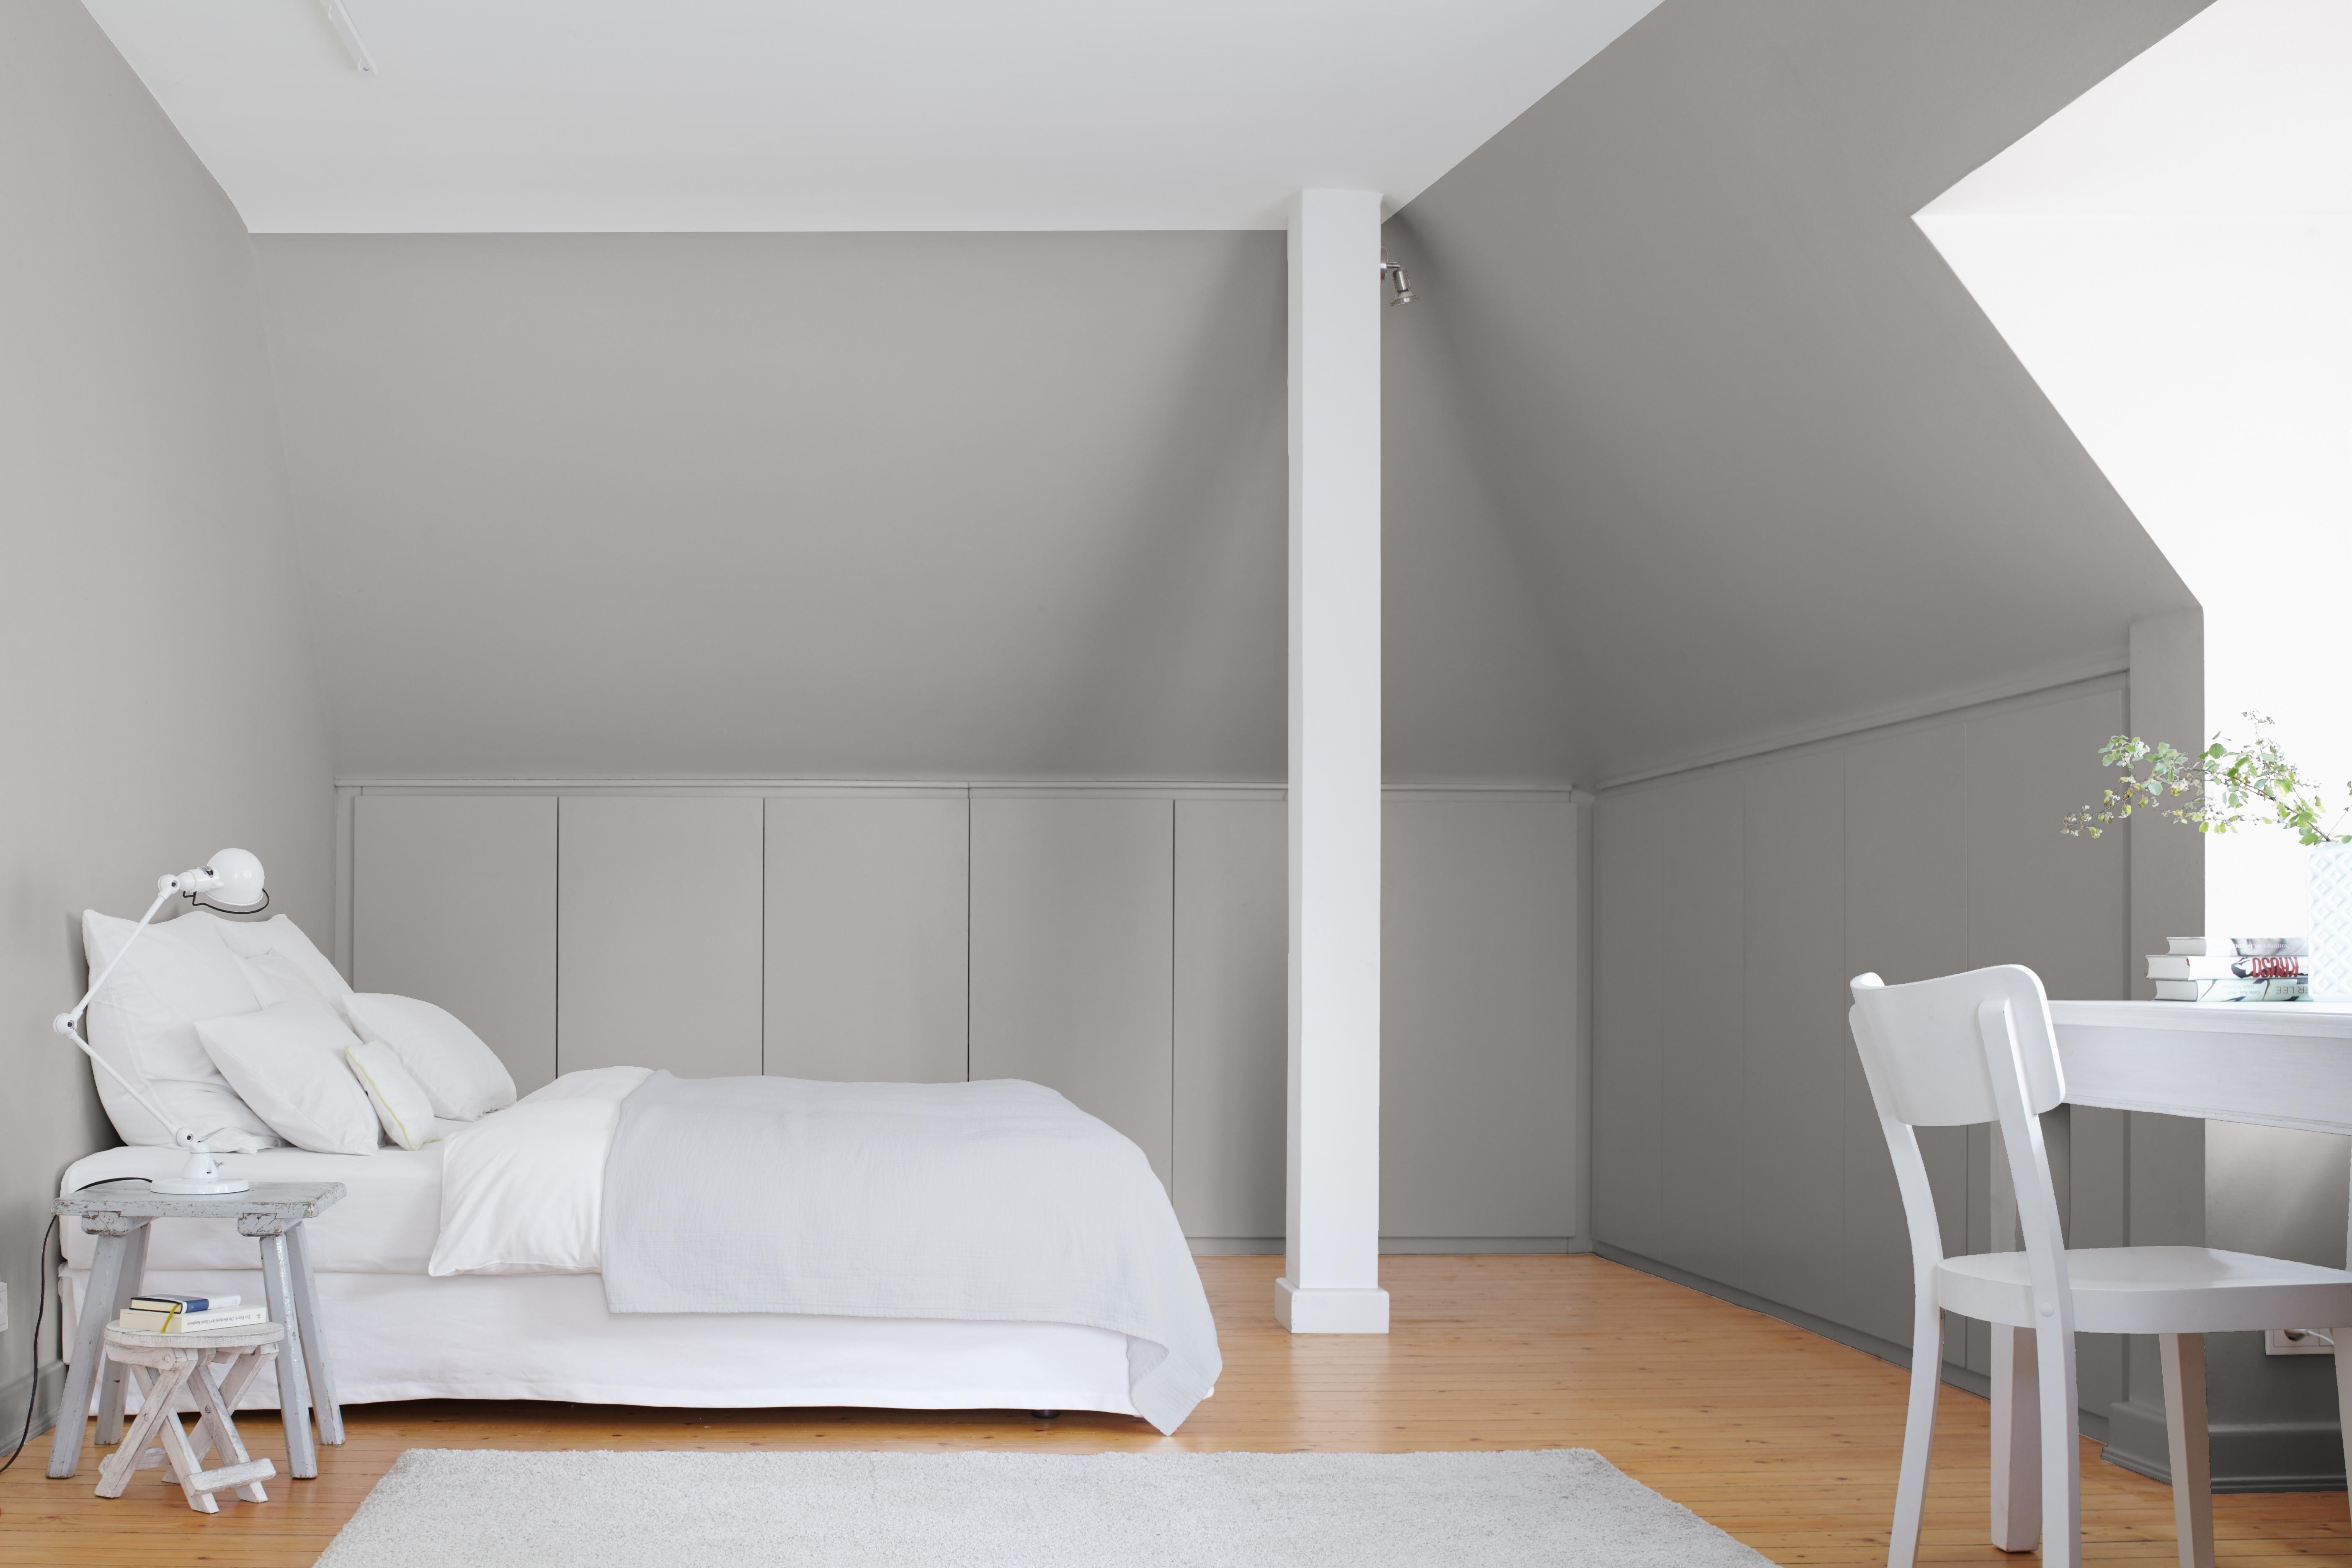 10 Einrichtungsideen Schlafzimmer Dachschräge Home Decor Design Your Home Small Home Plan